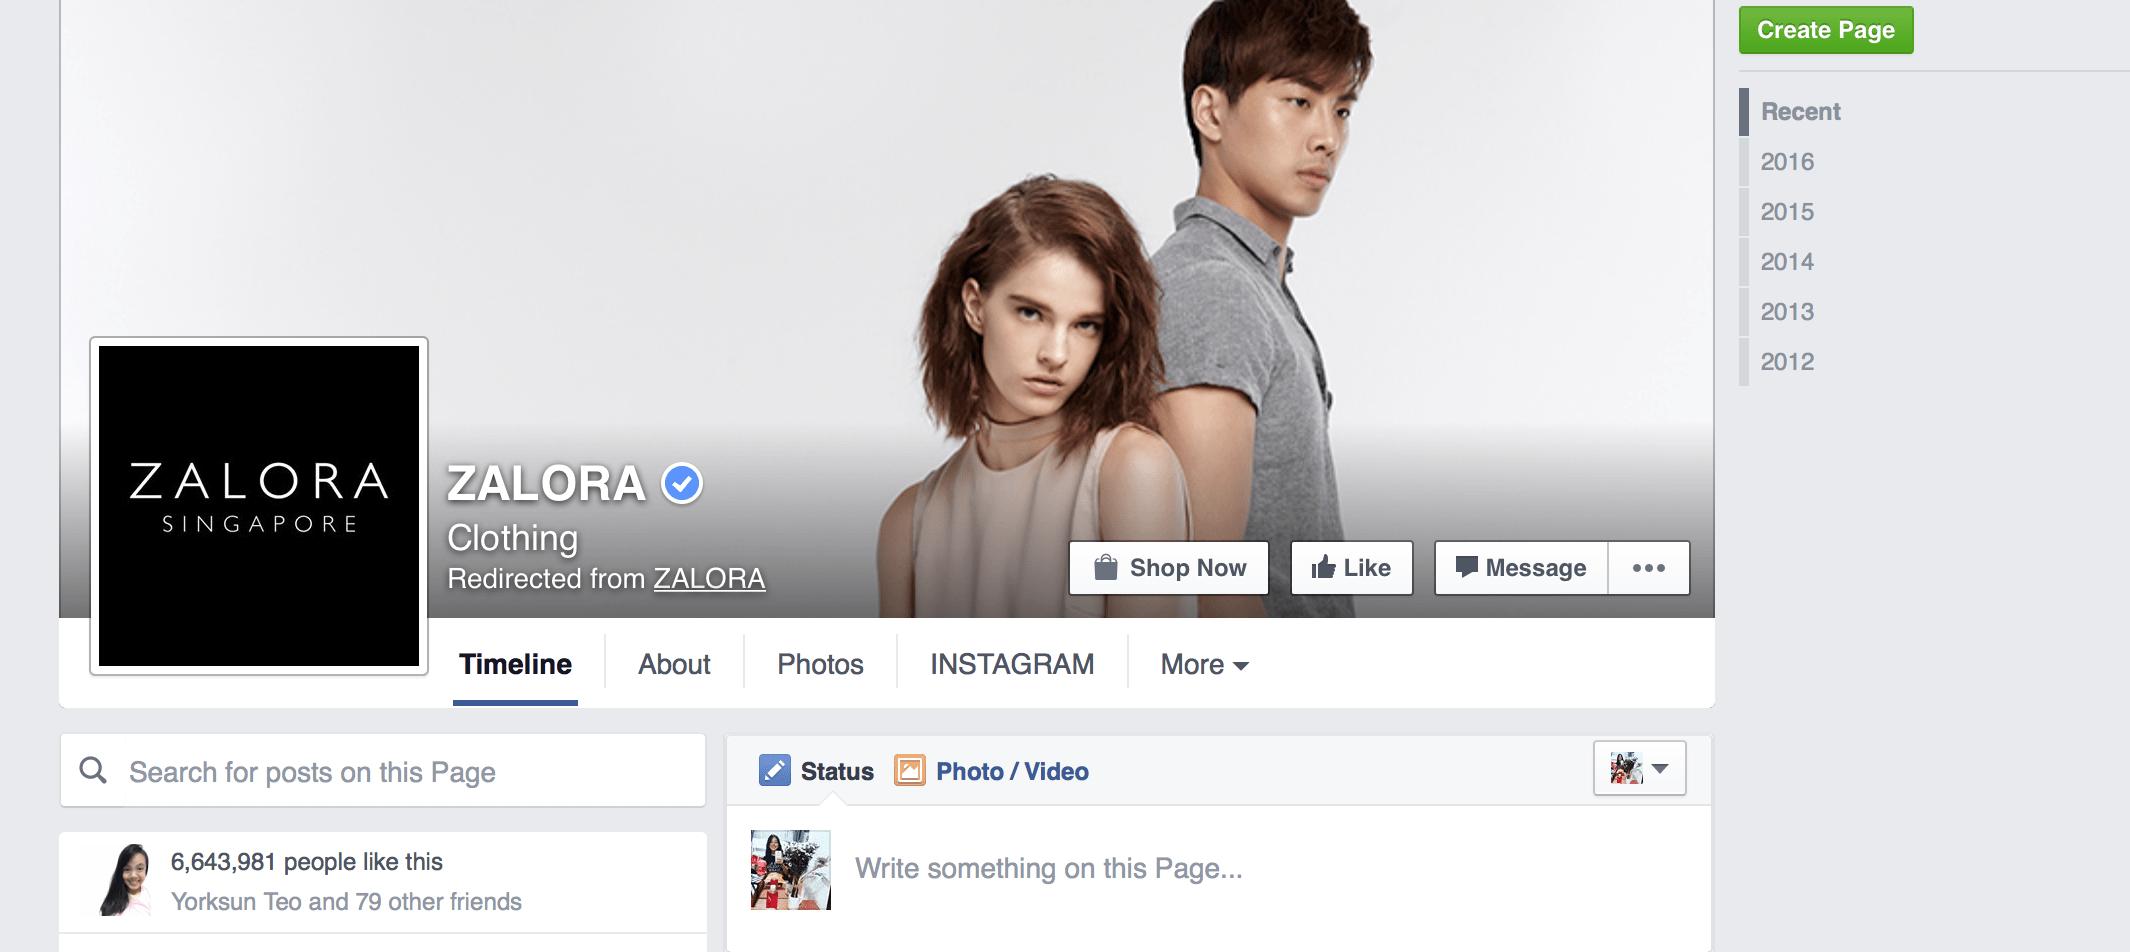 Zalora Facebook online presence